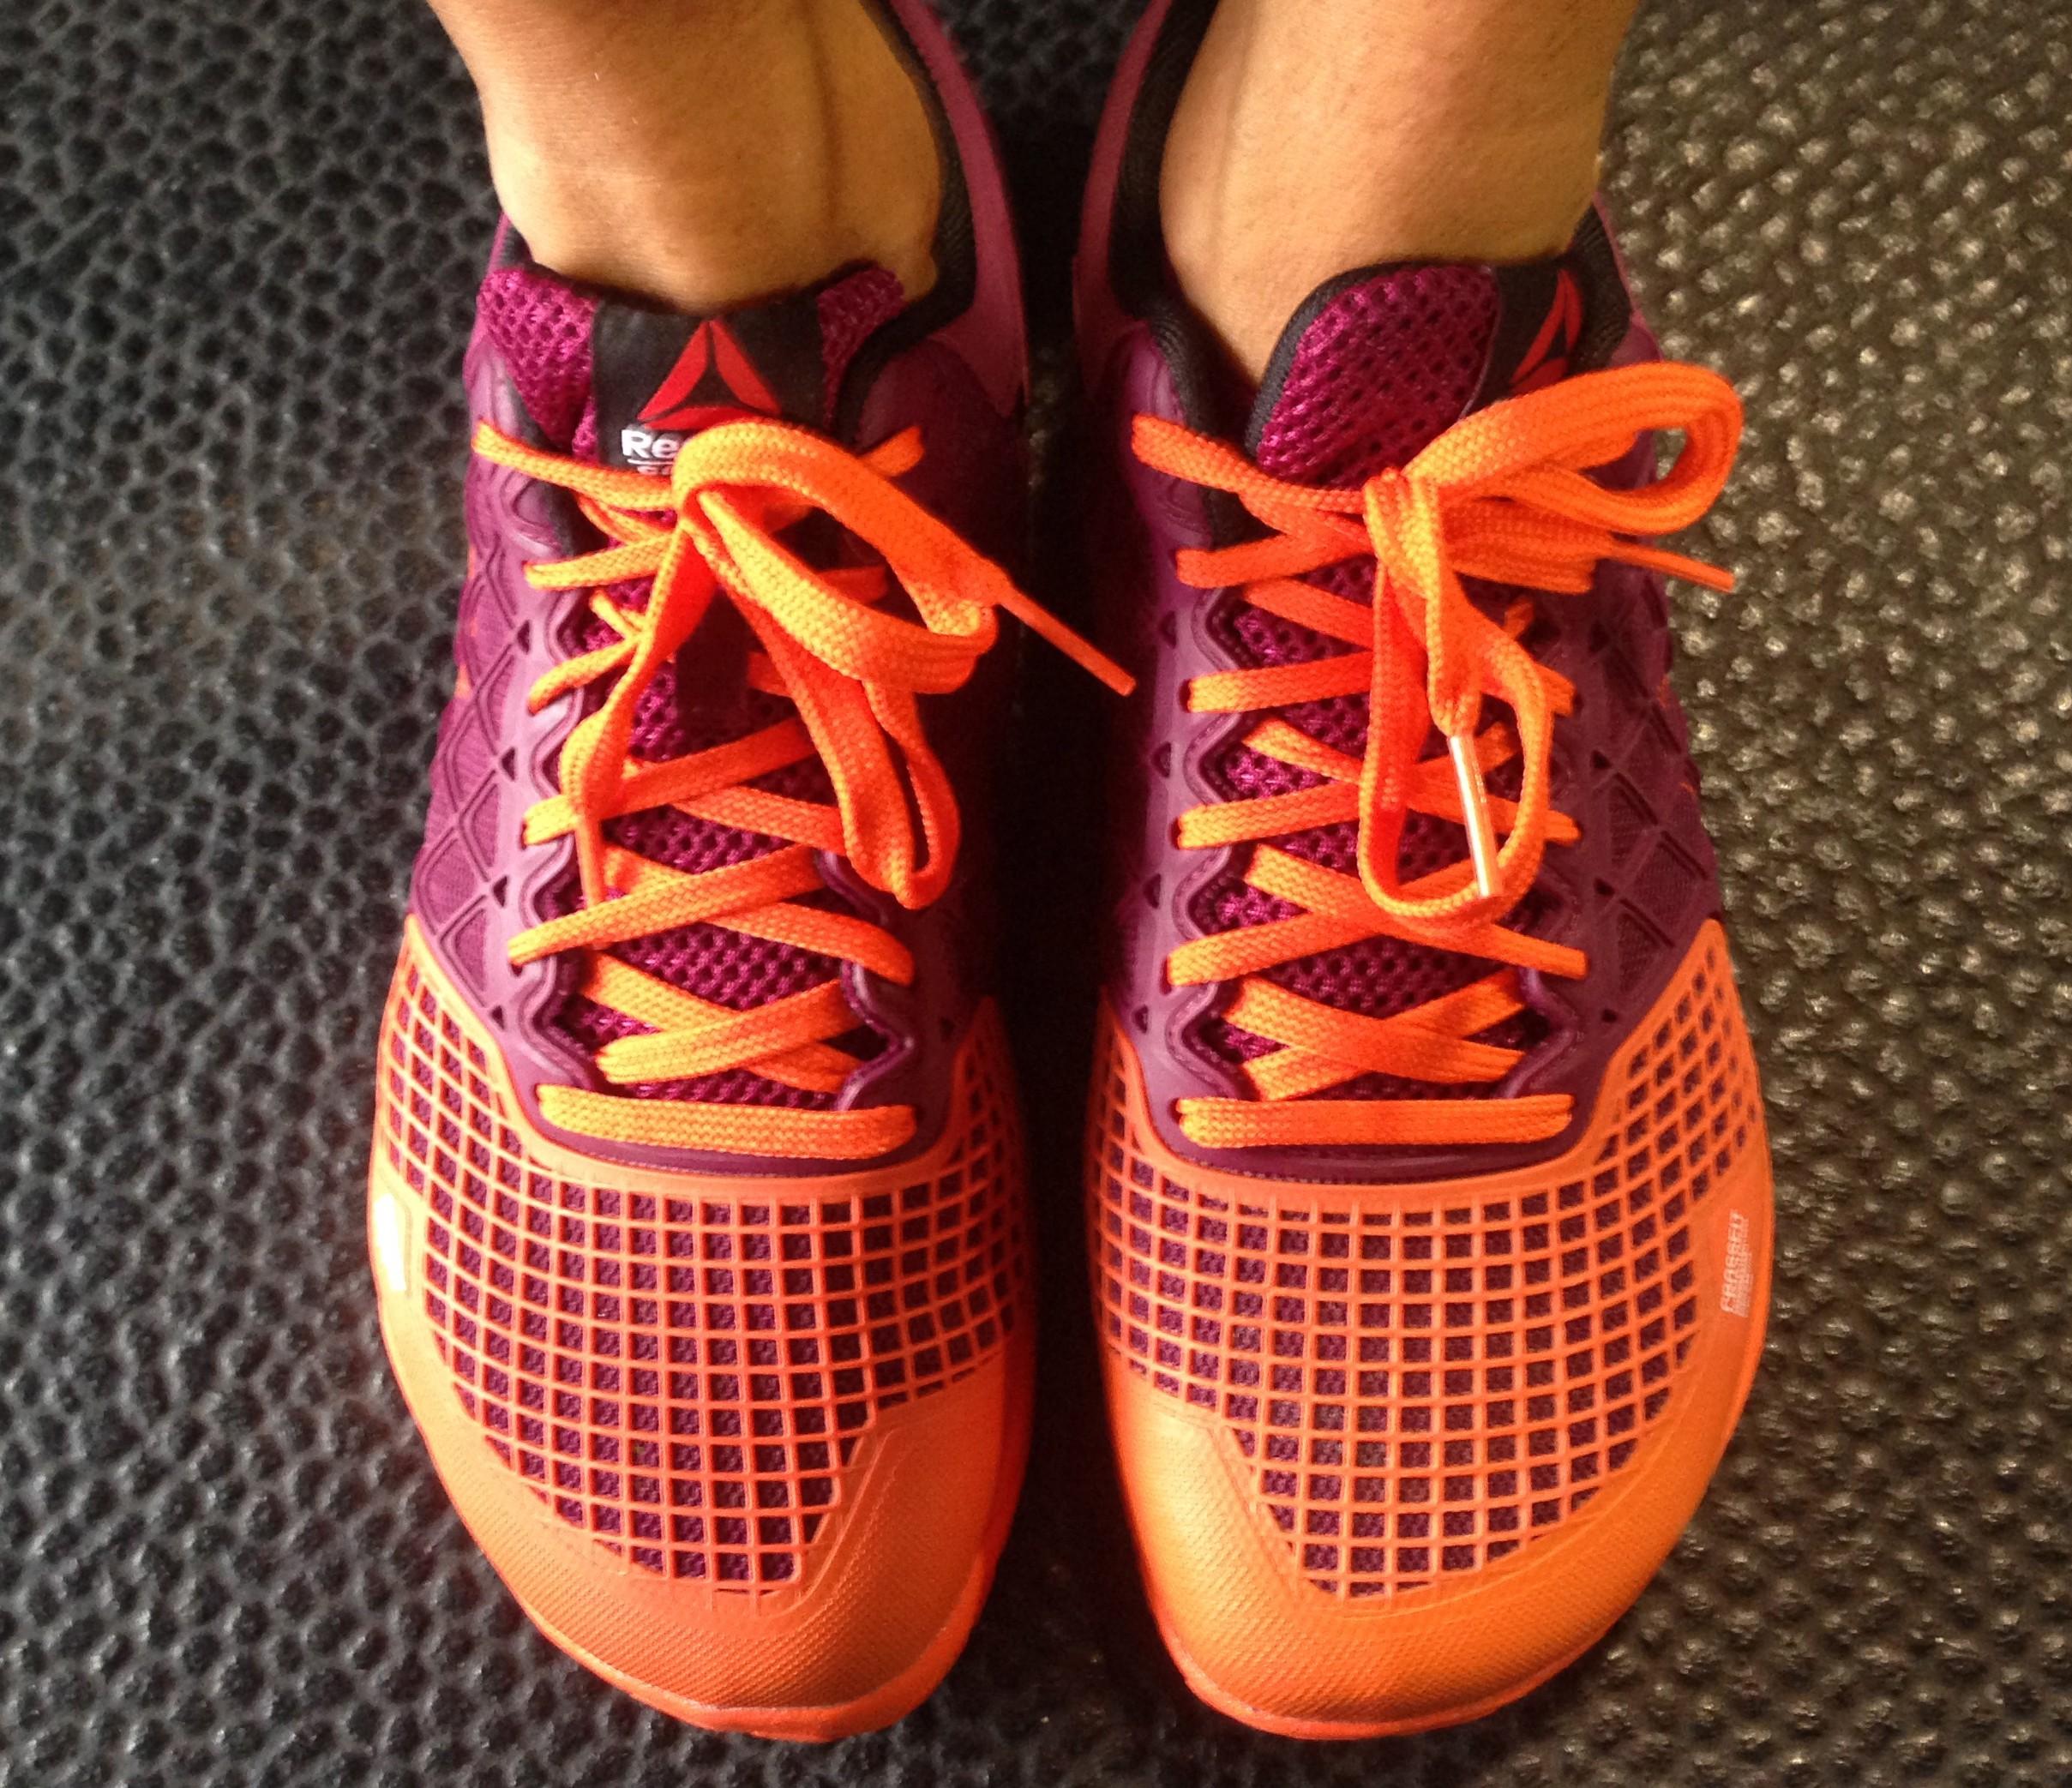 Nano 4.0: The Perfect Gym Shoe » PfitBlog